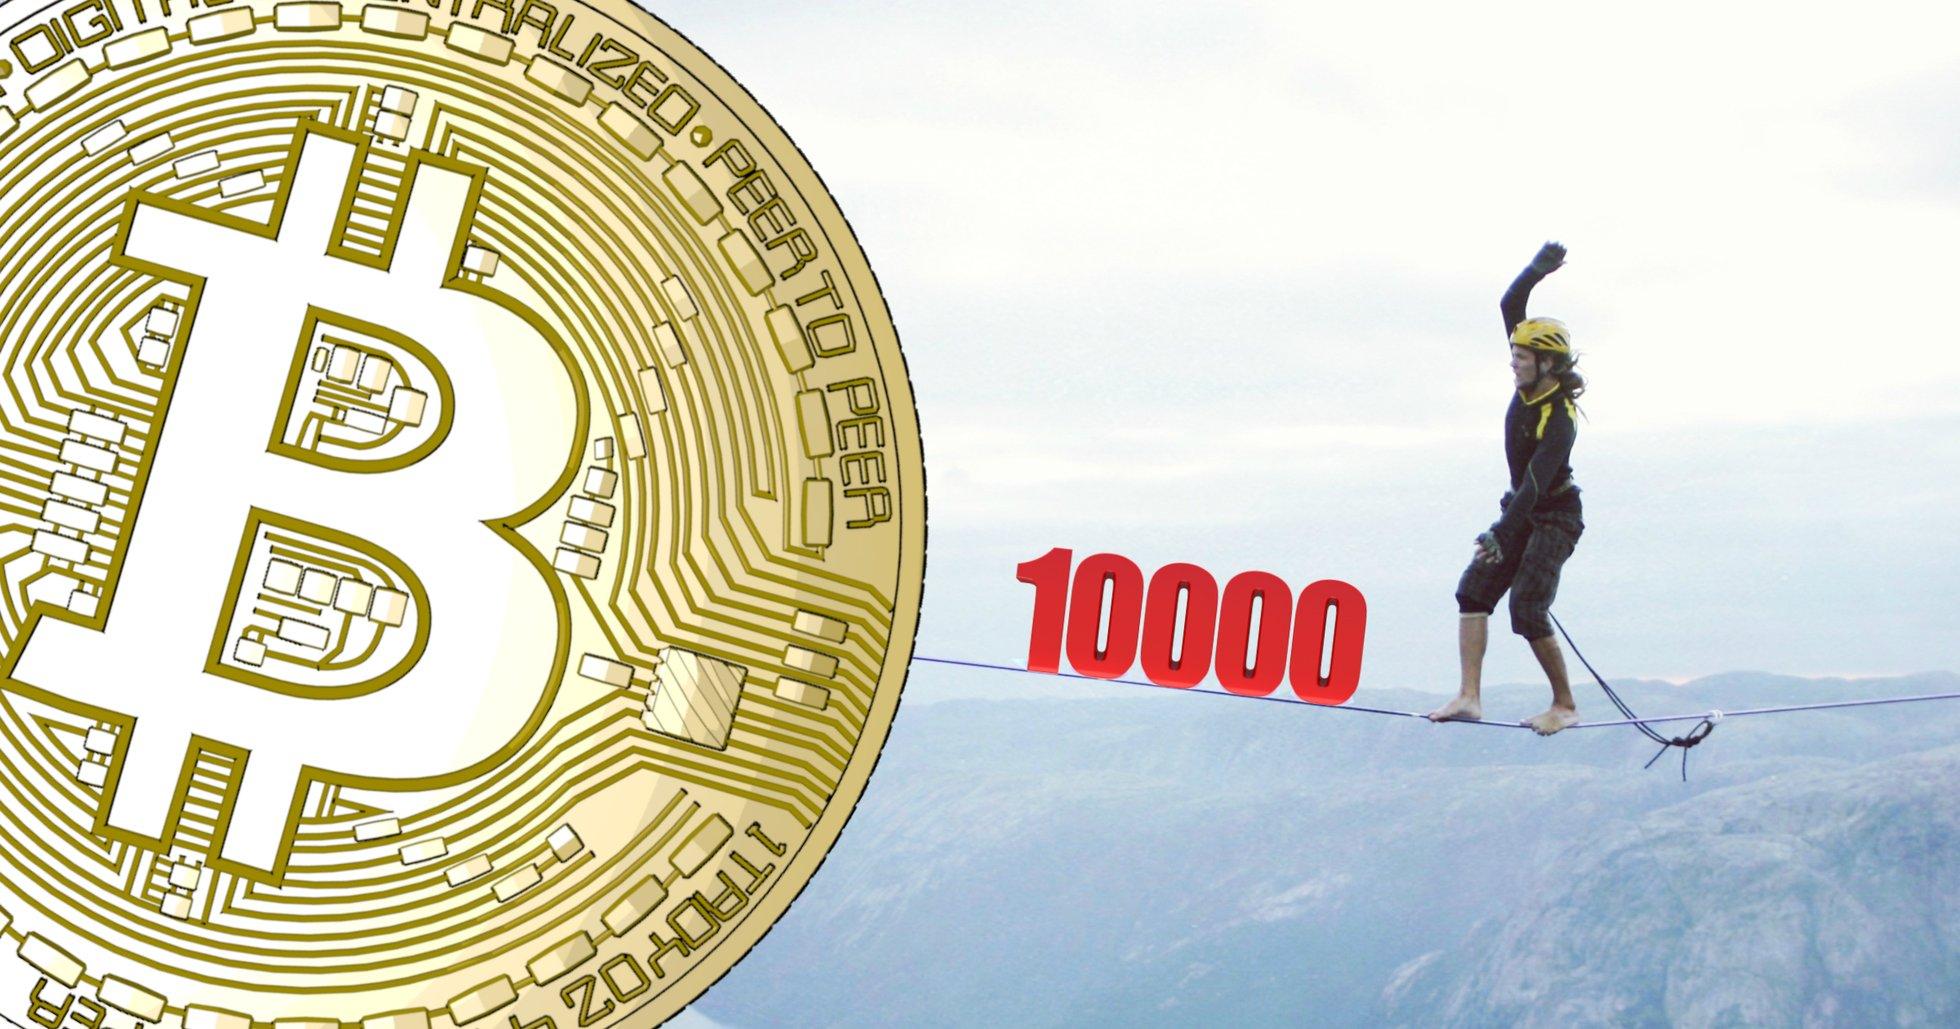 Bitcoin's dominance below 70 percent again – price balances around $10,000.